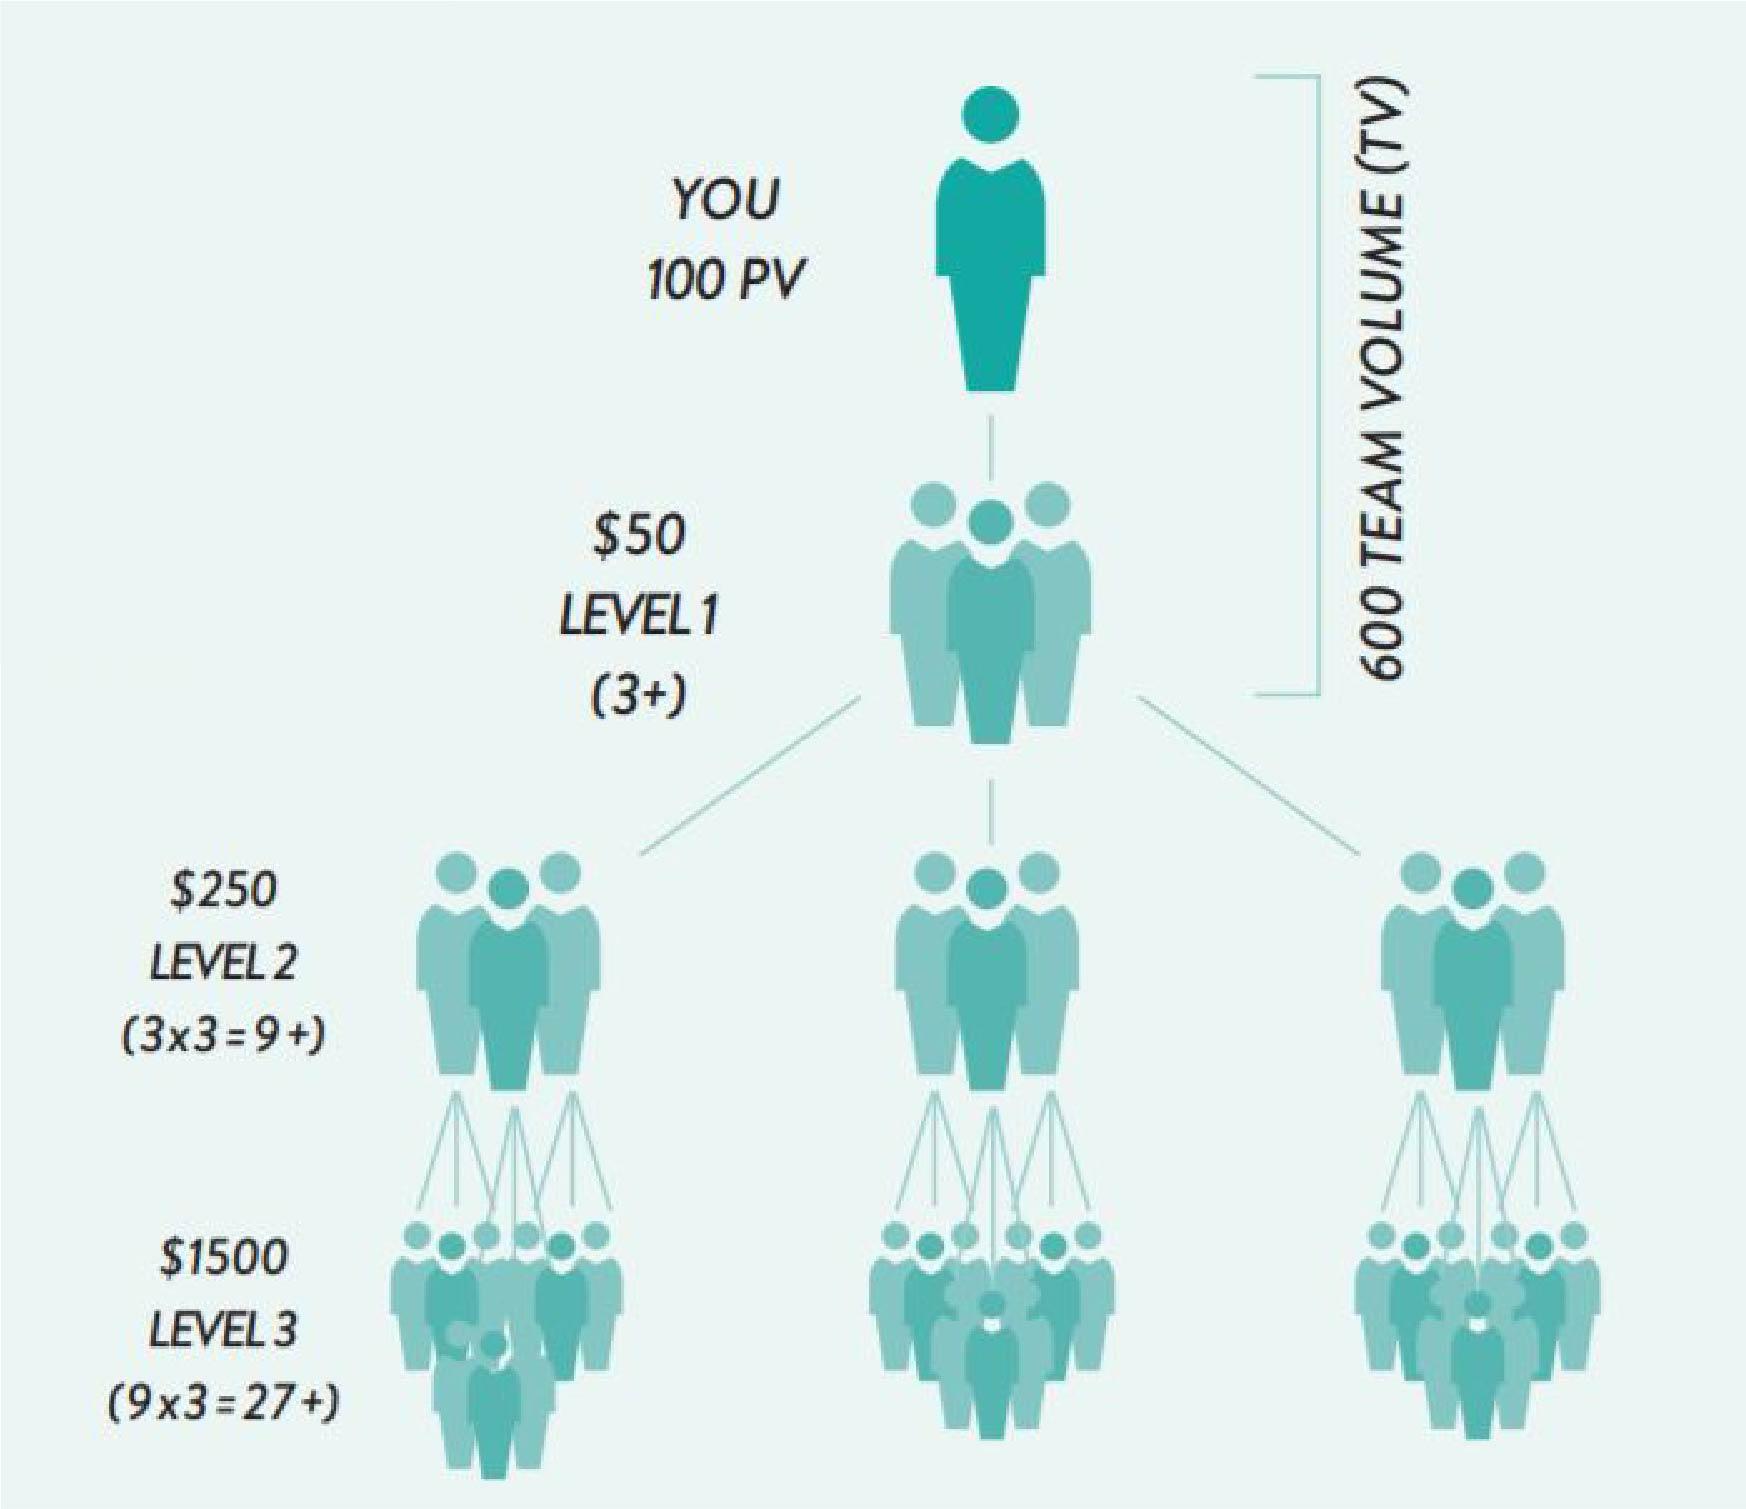 Power of 3Team Bonus - Paid monthly based on structure. Each team needs 600 TV to receive this sponsor bonus.